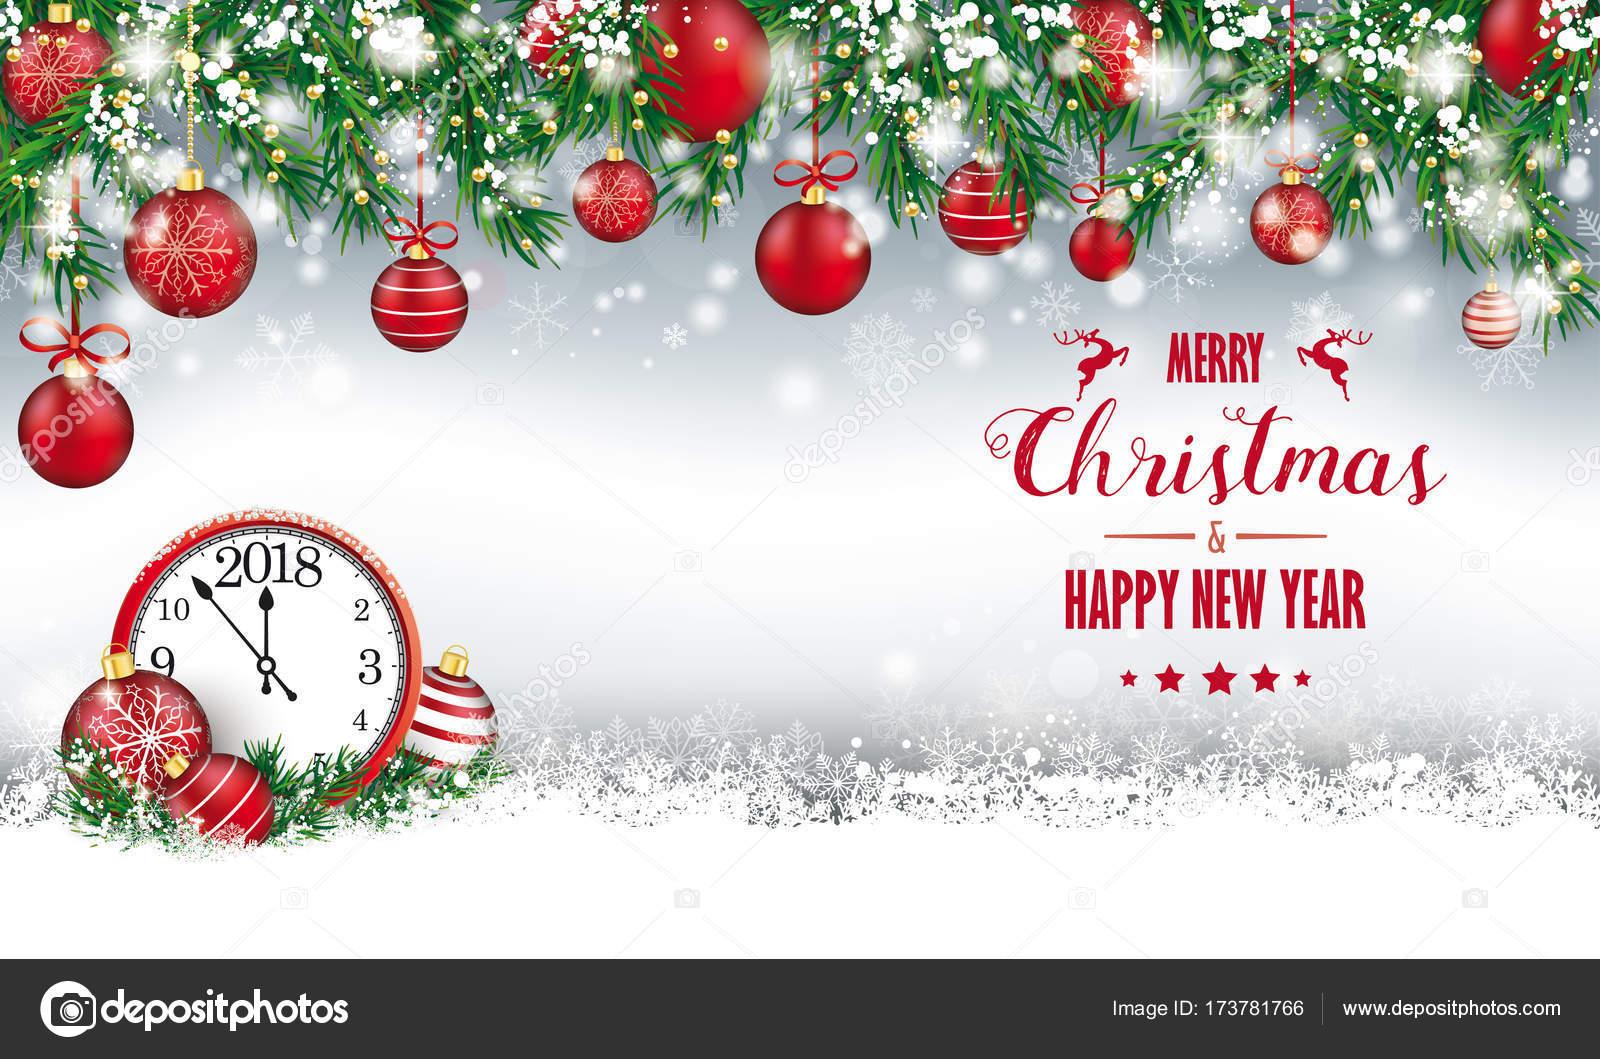 Christmas Header.Merry Christmas Header Green Twigs Snow Baubles Clock 2018